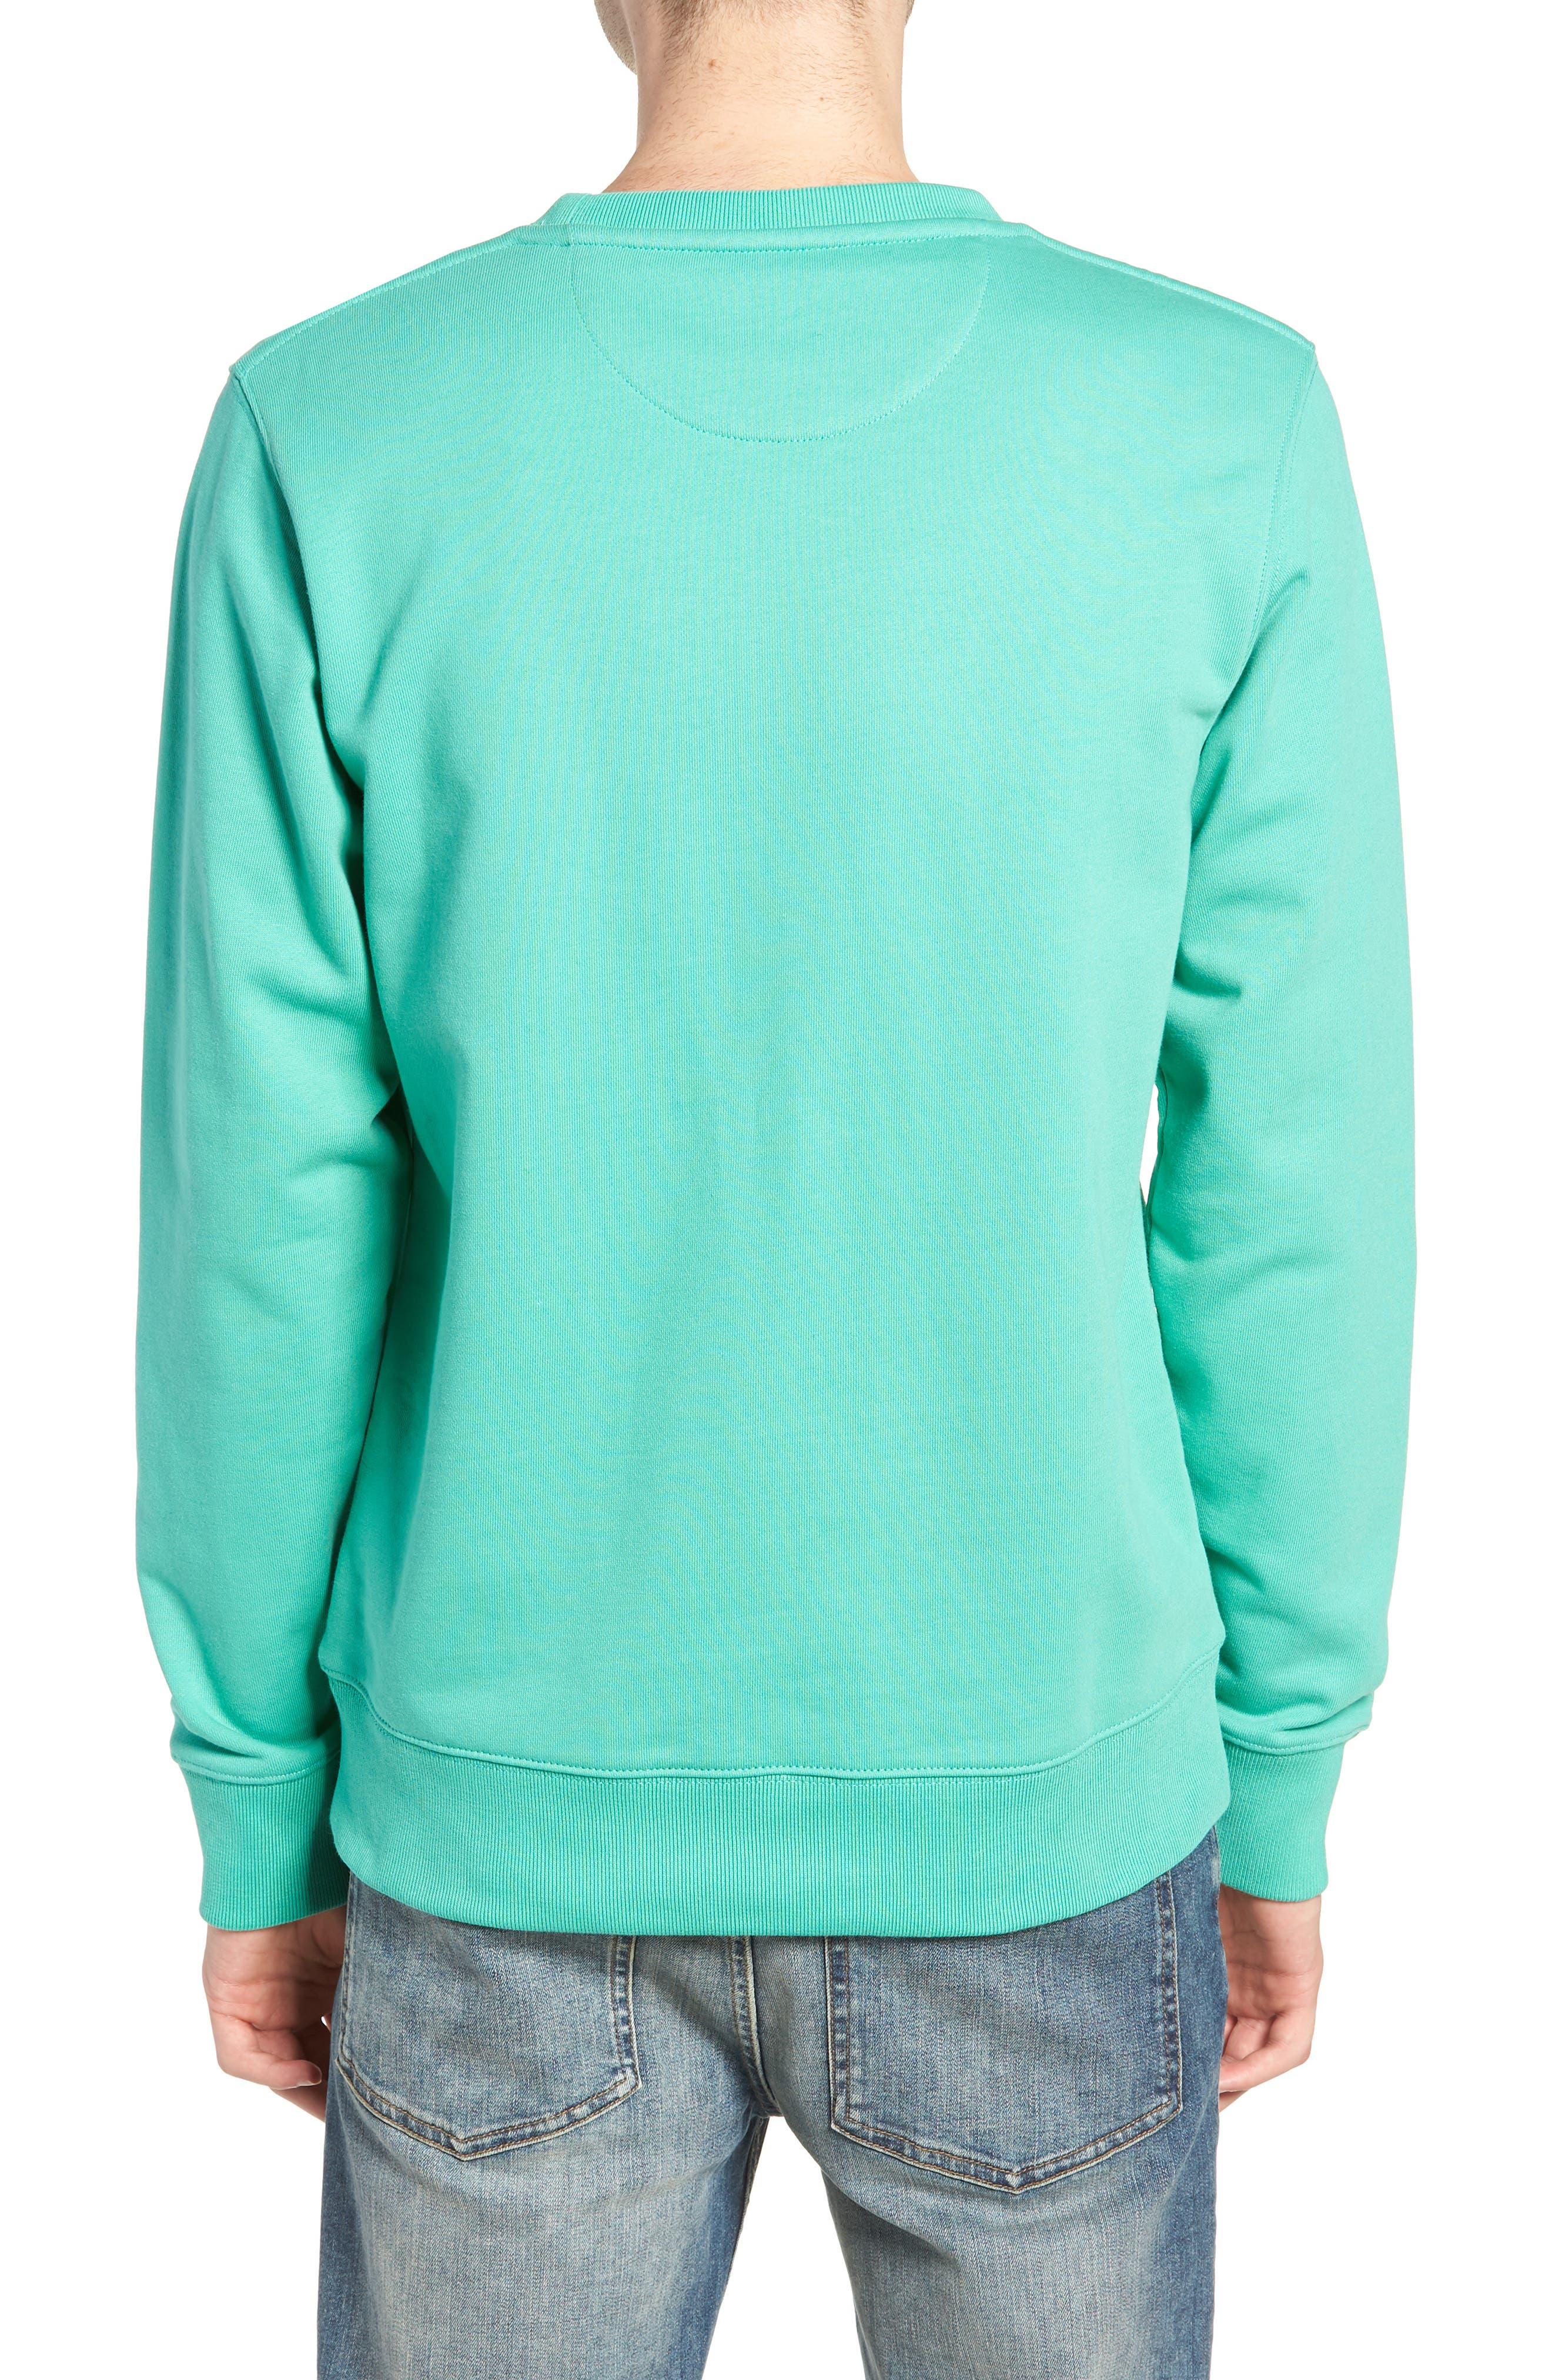 Bowery Embroidered Fleece Sweatshirt,                             Alternate thumbnail 2, color,                             SEAFOAM GREEN